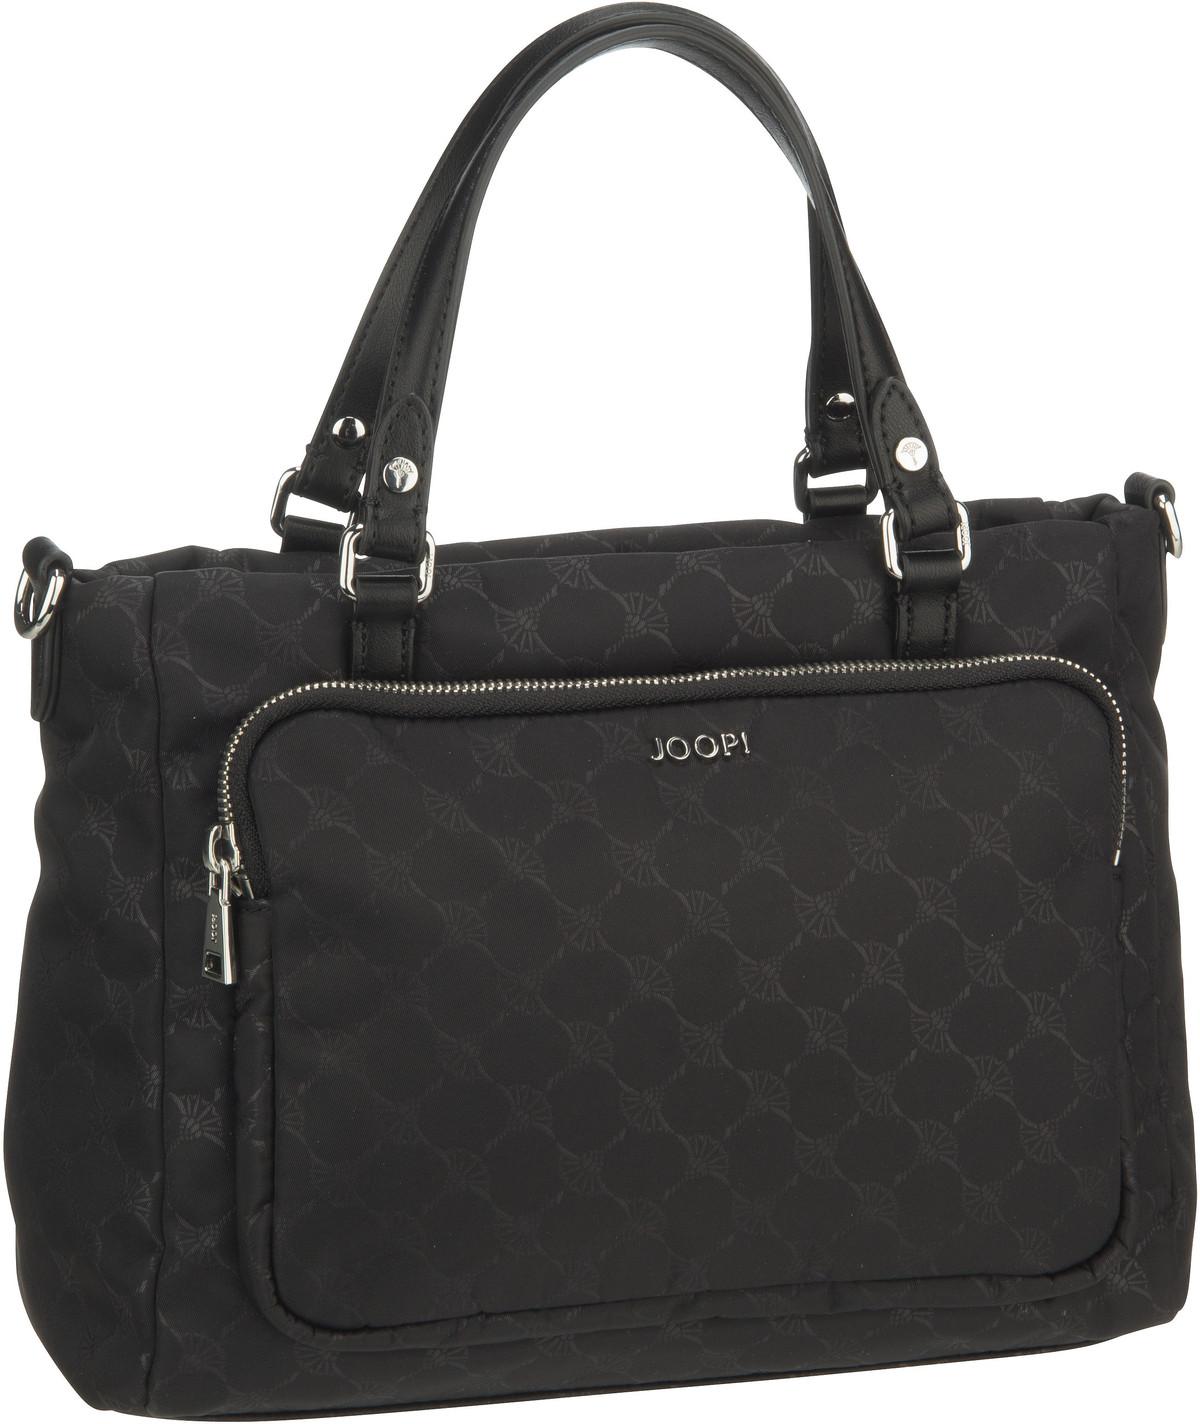 Handtasche Nylon Cornflower Elvira Handbag SHZ Black